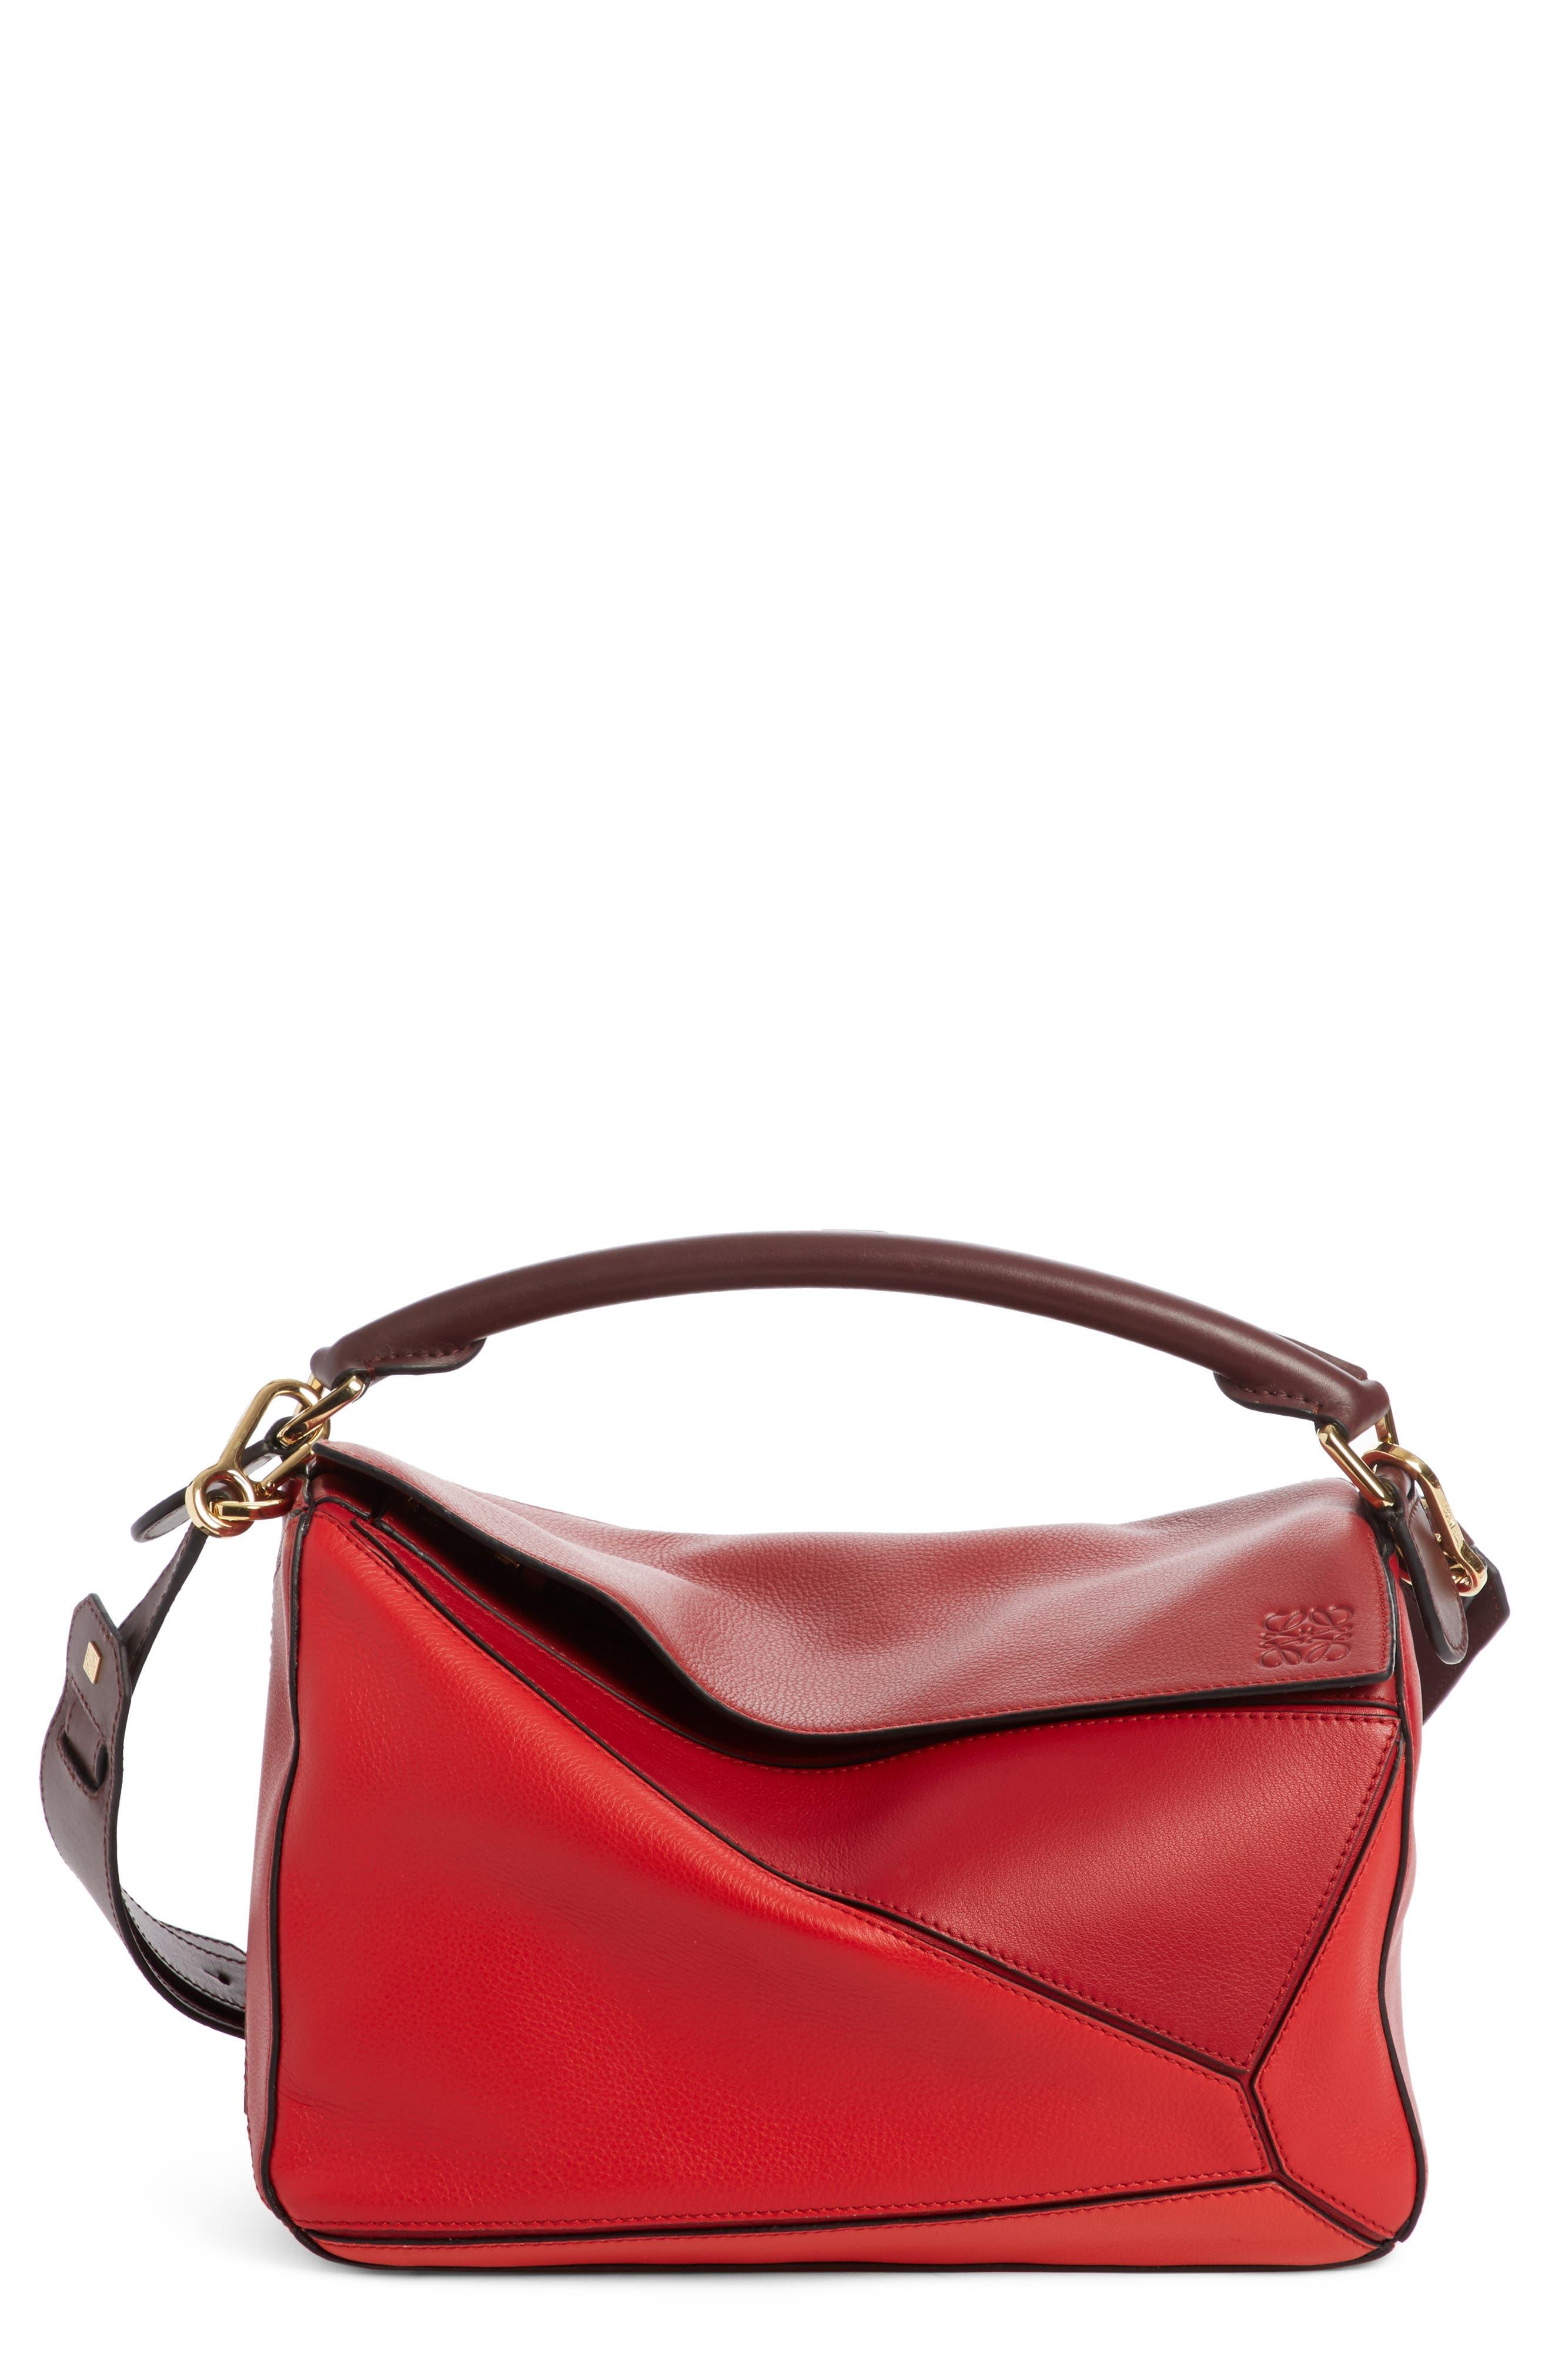 LOEWE Medium Puzzle Colorblock Leather Shoulder Bag